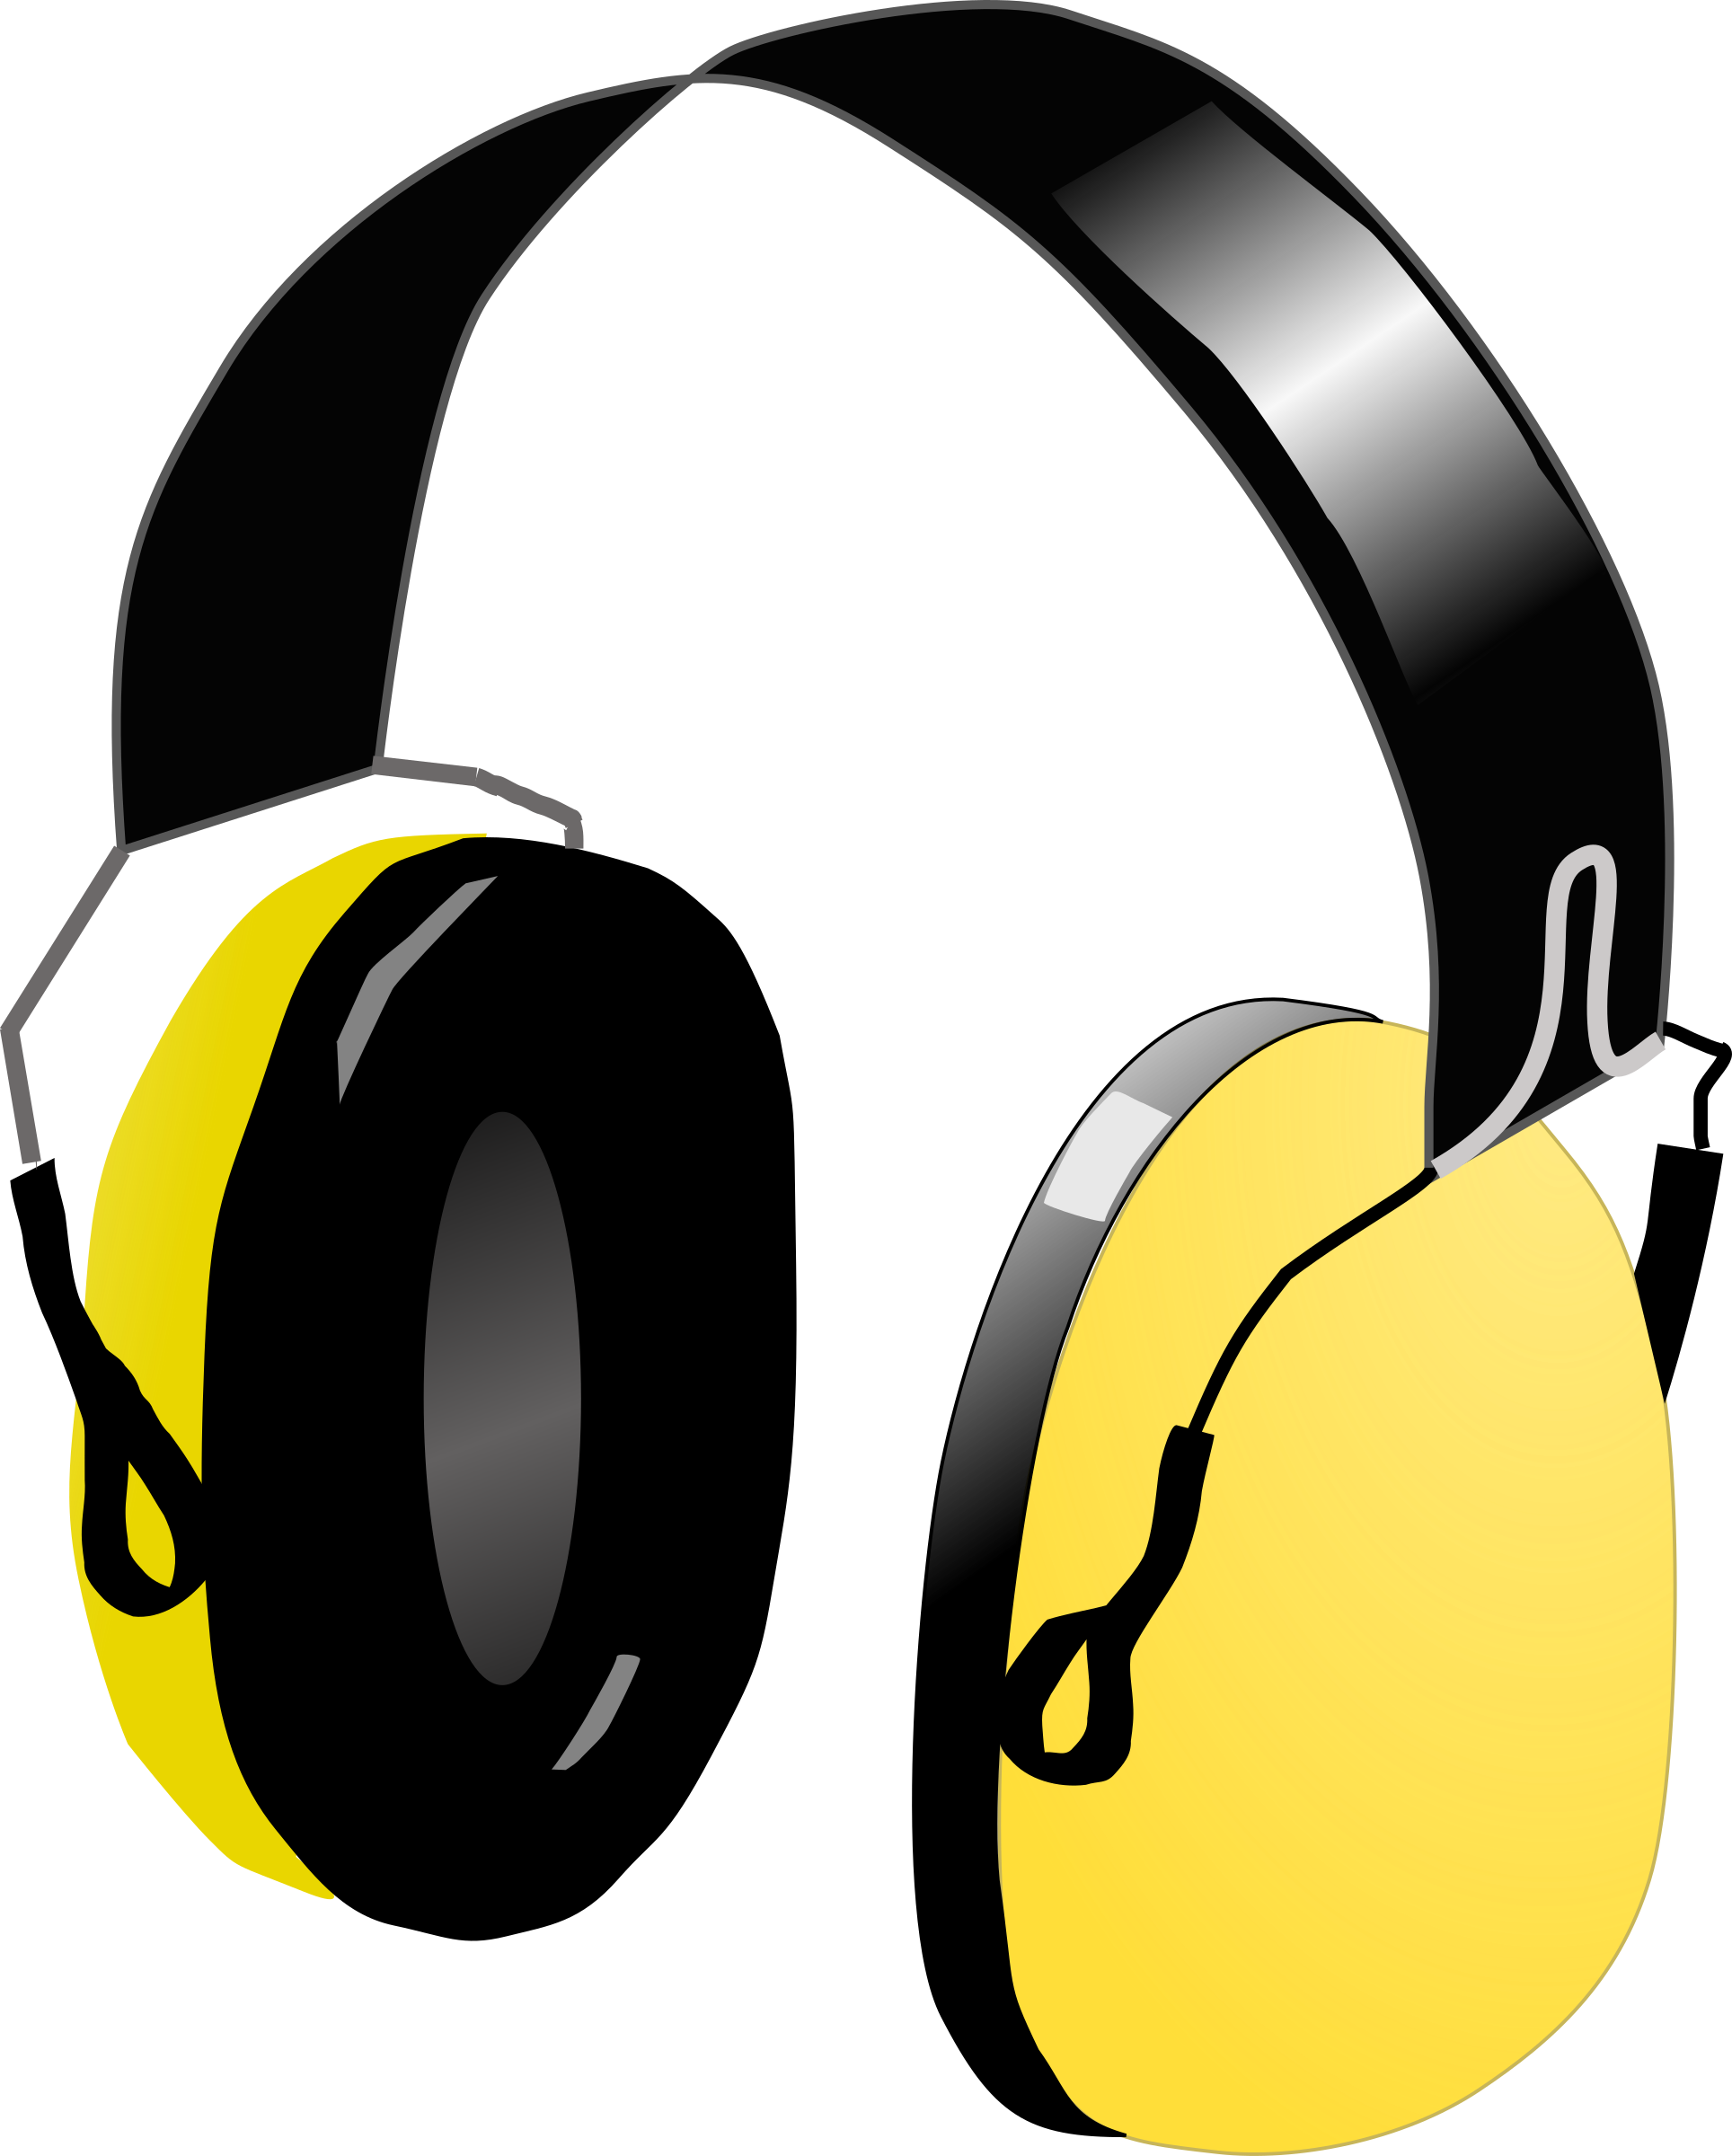 Headphones icons png free. Retro clipart headphone